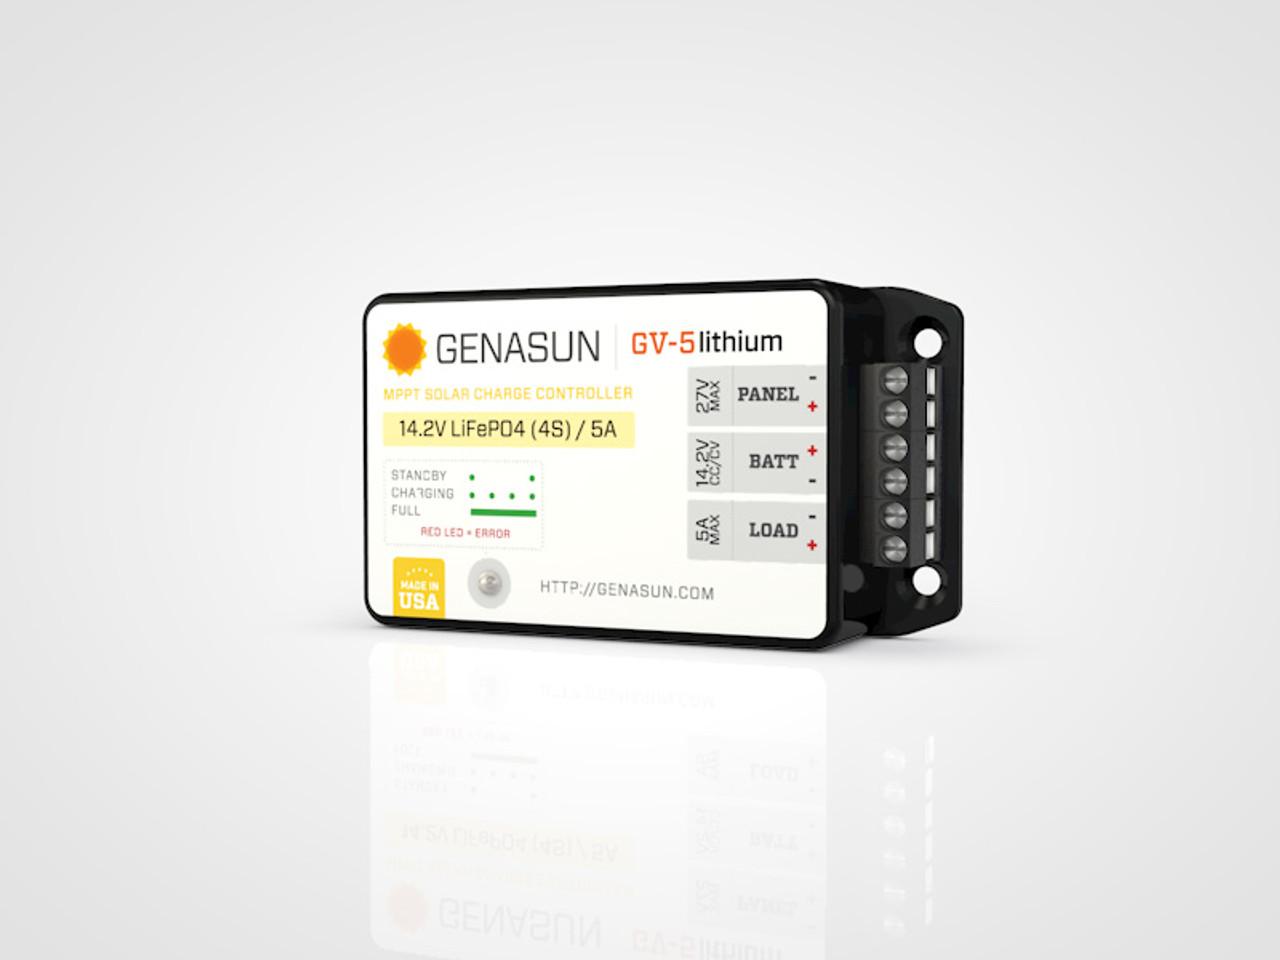 GV-5 | 65W 5A 14.2V Genasun MPPT Solar Charge Controller - Li - Right1